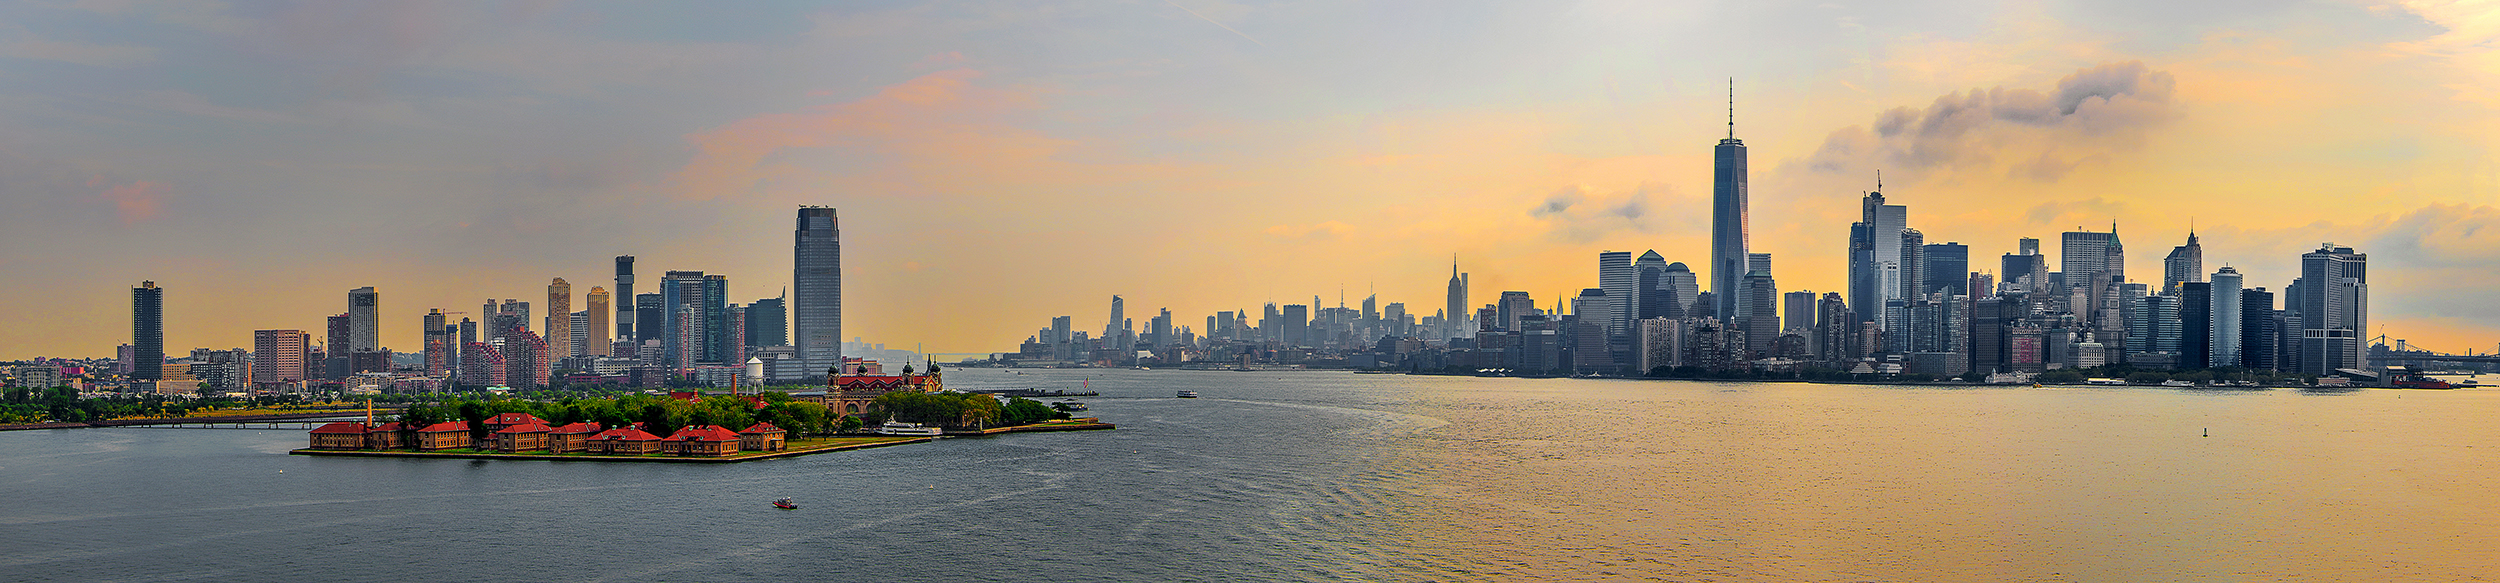 NYC Panorama.jpg